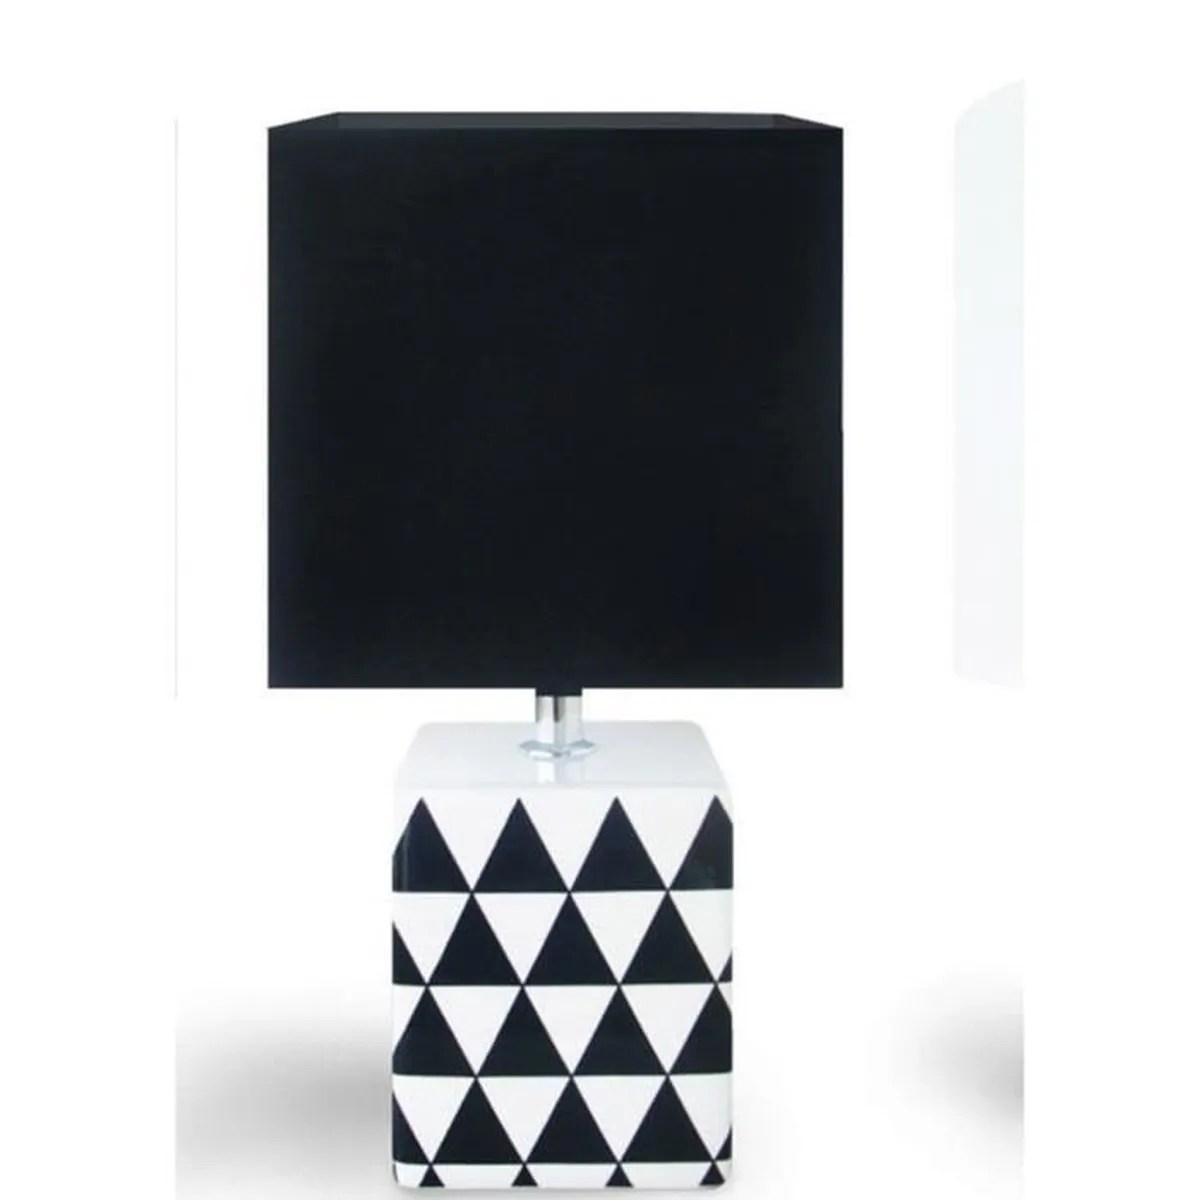 Lampe Design Noire Lampe Loft Recup Monsieur Cyclope Agcrewall